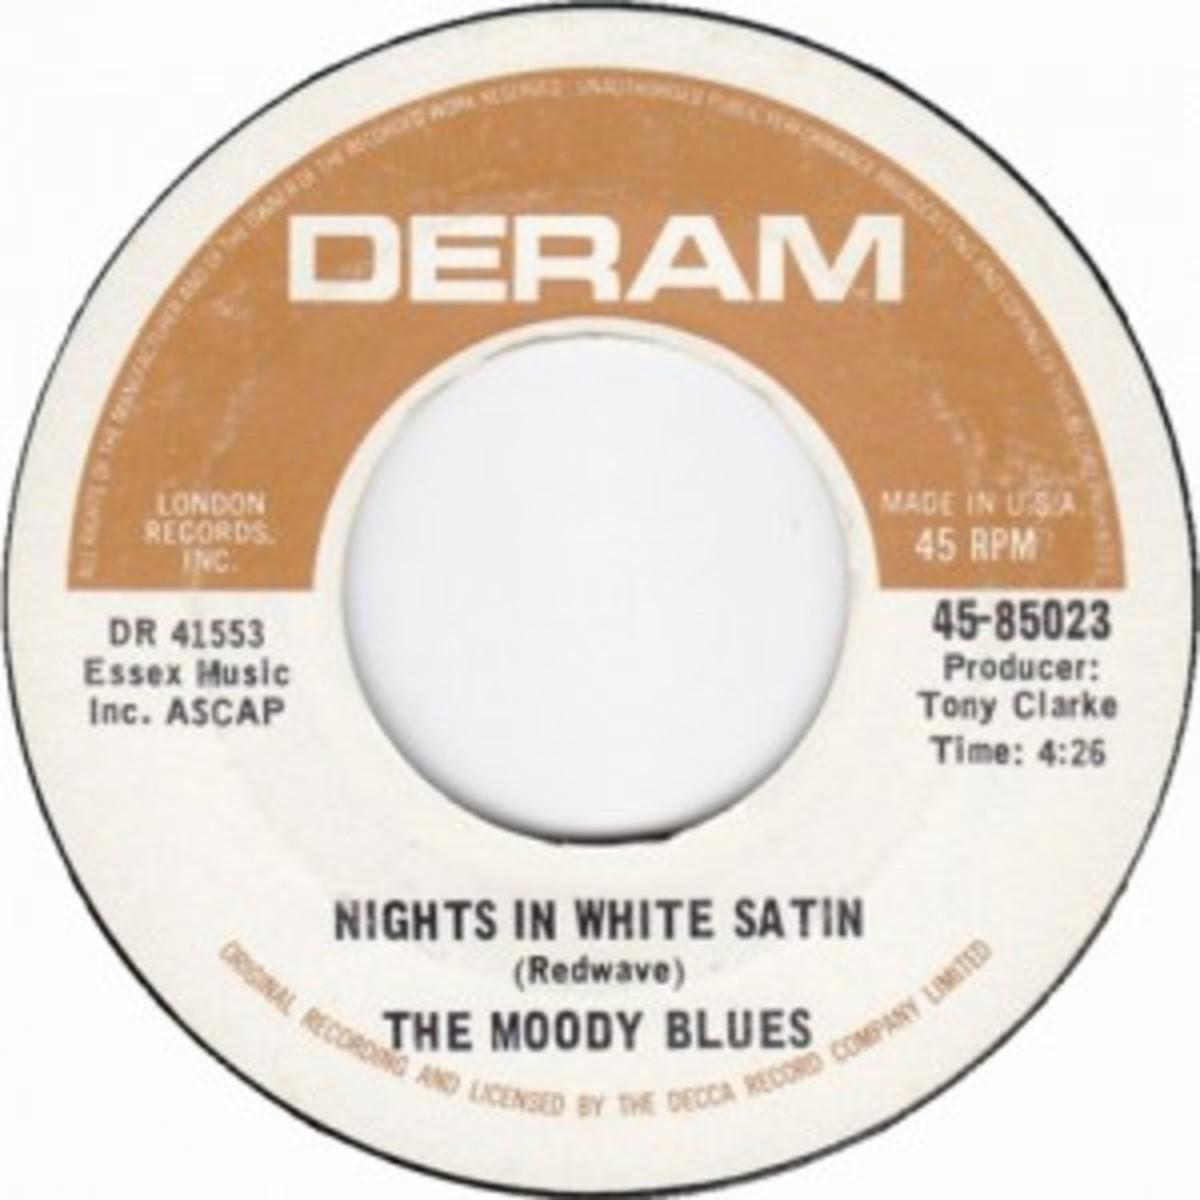 Moody Blues Nights In White Satin on Deram